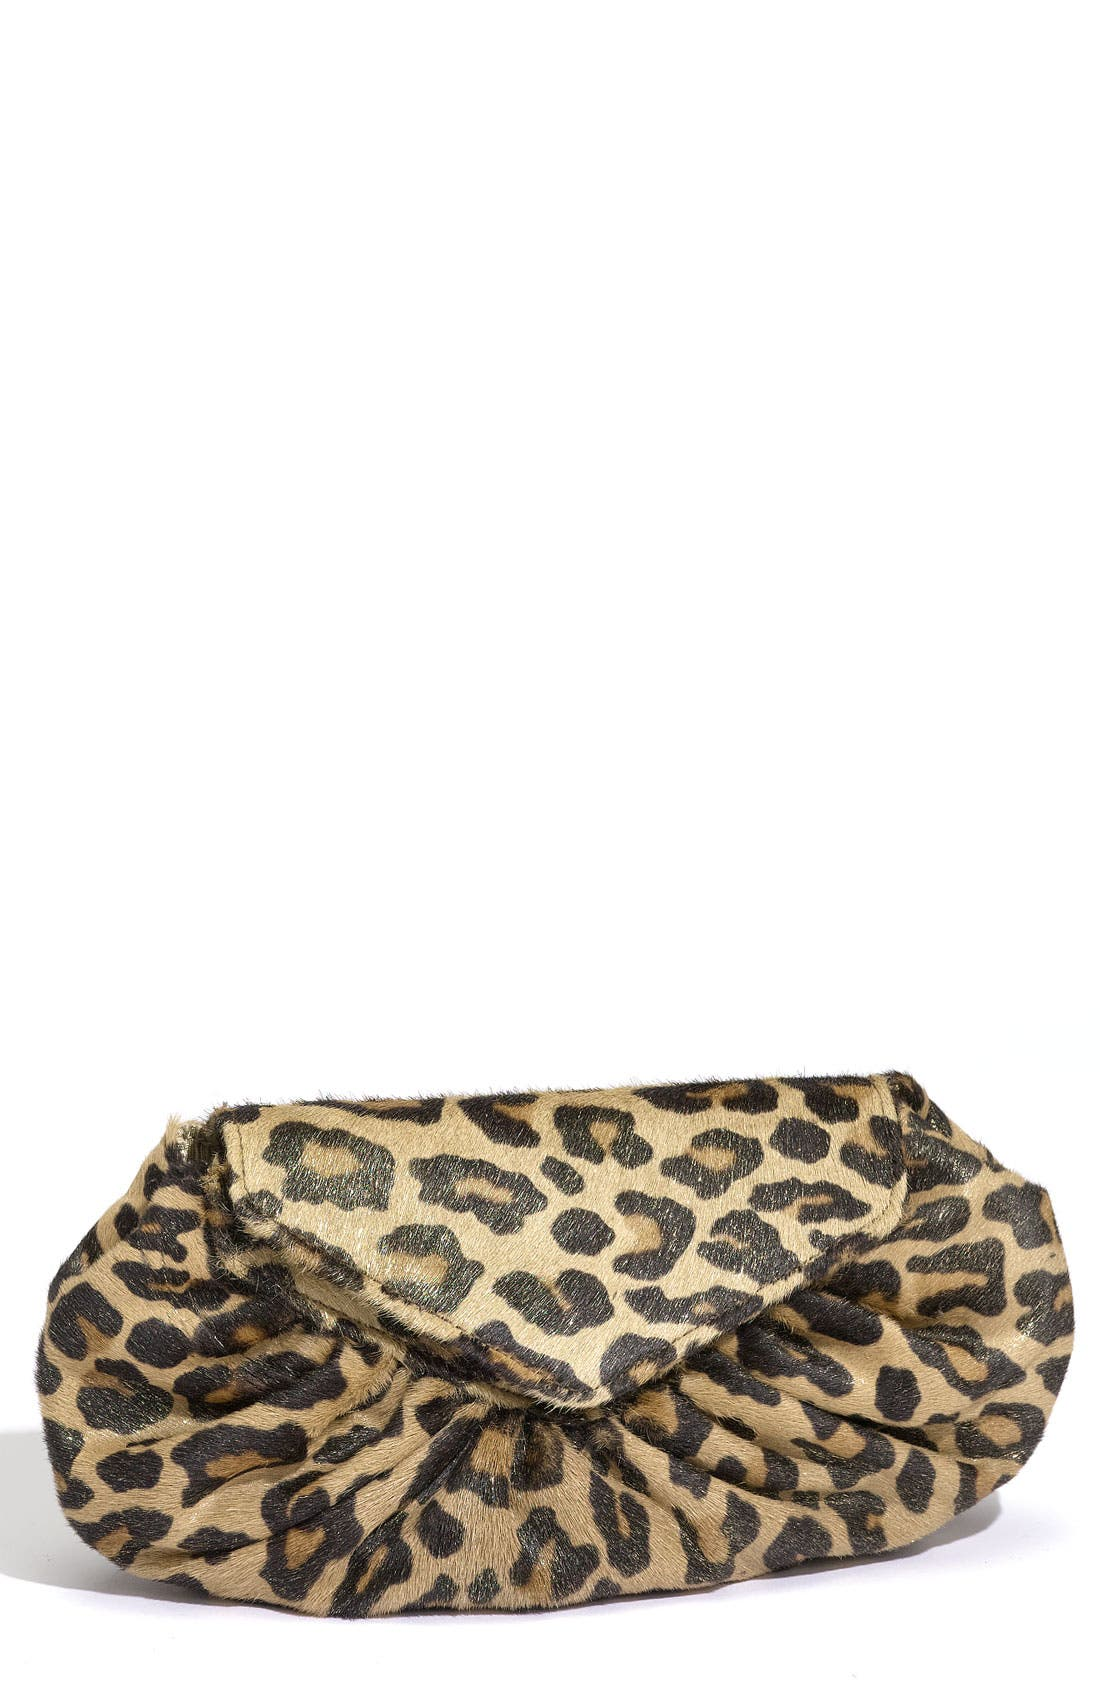 Main Image - Lauren Merkin 'Diana' Leopard Print Clutch